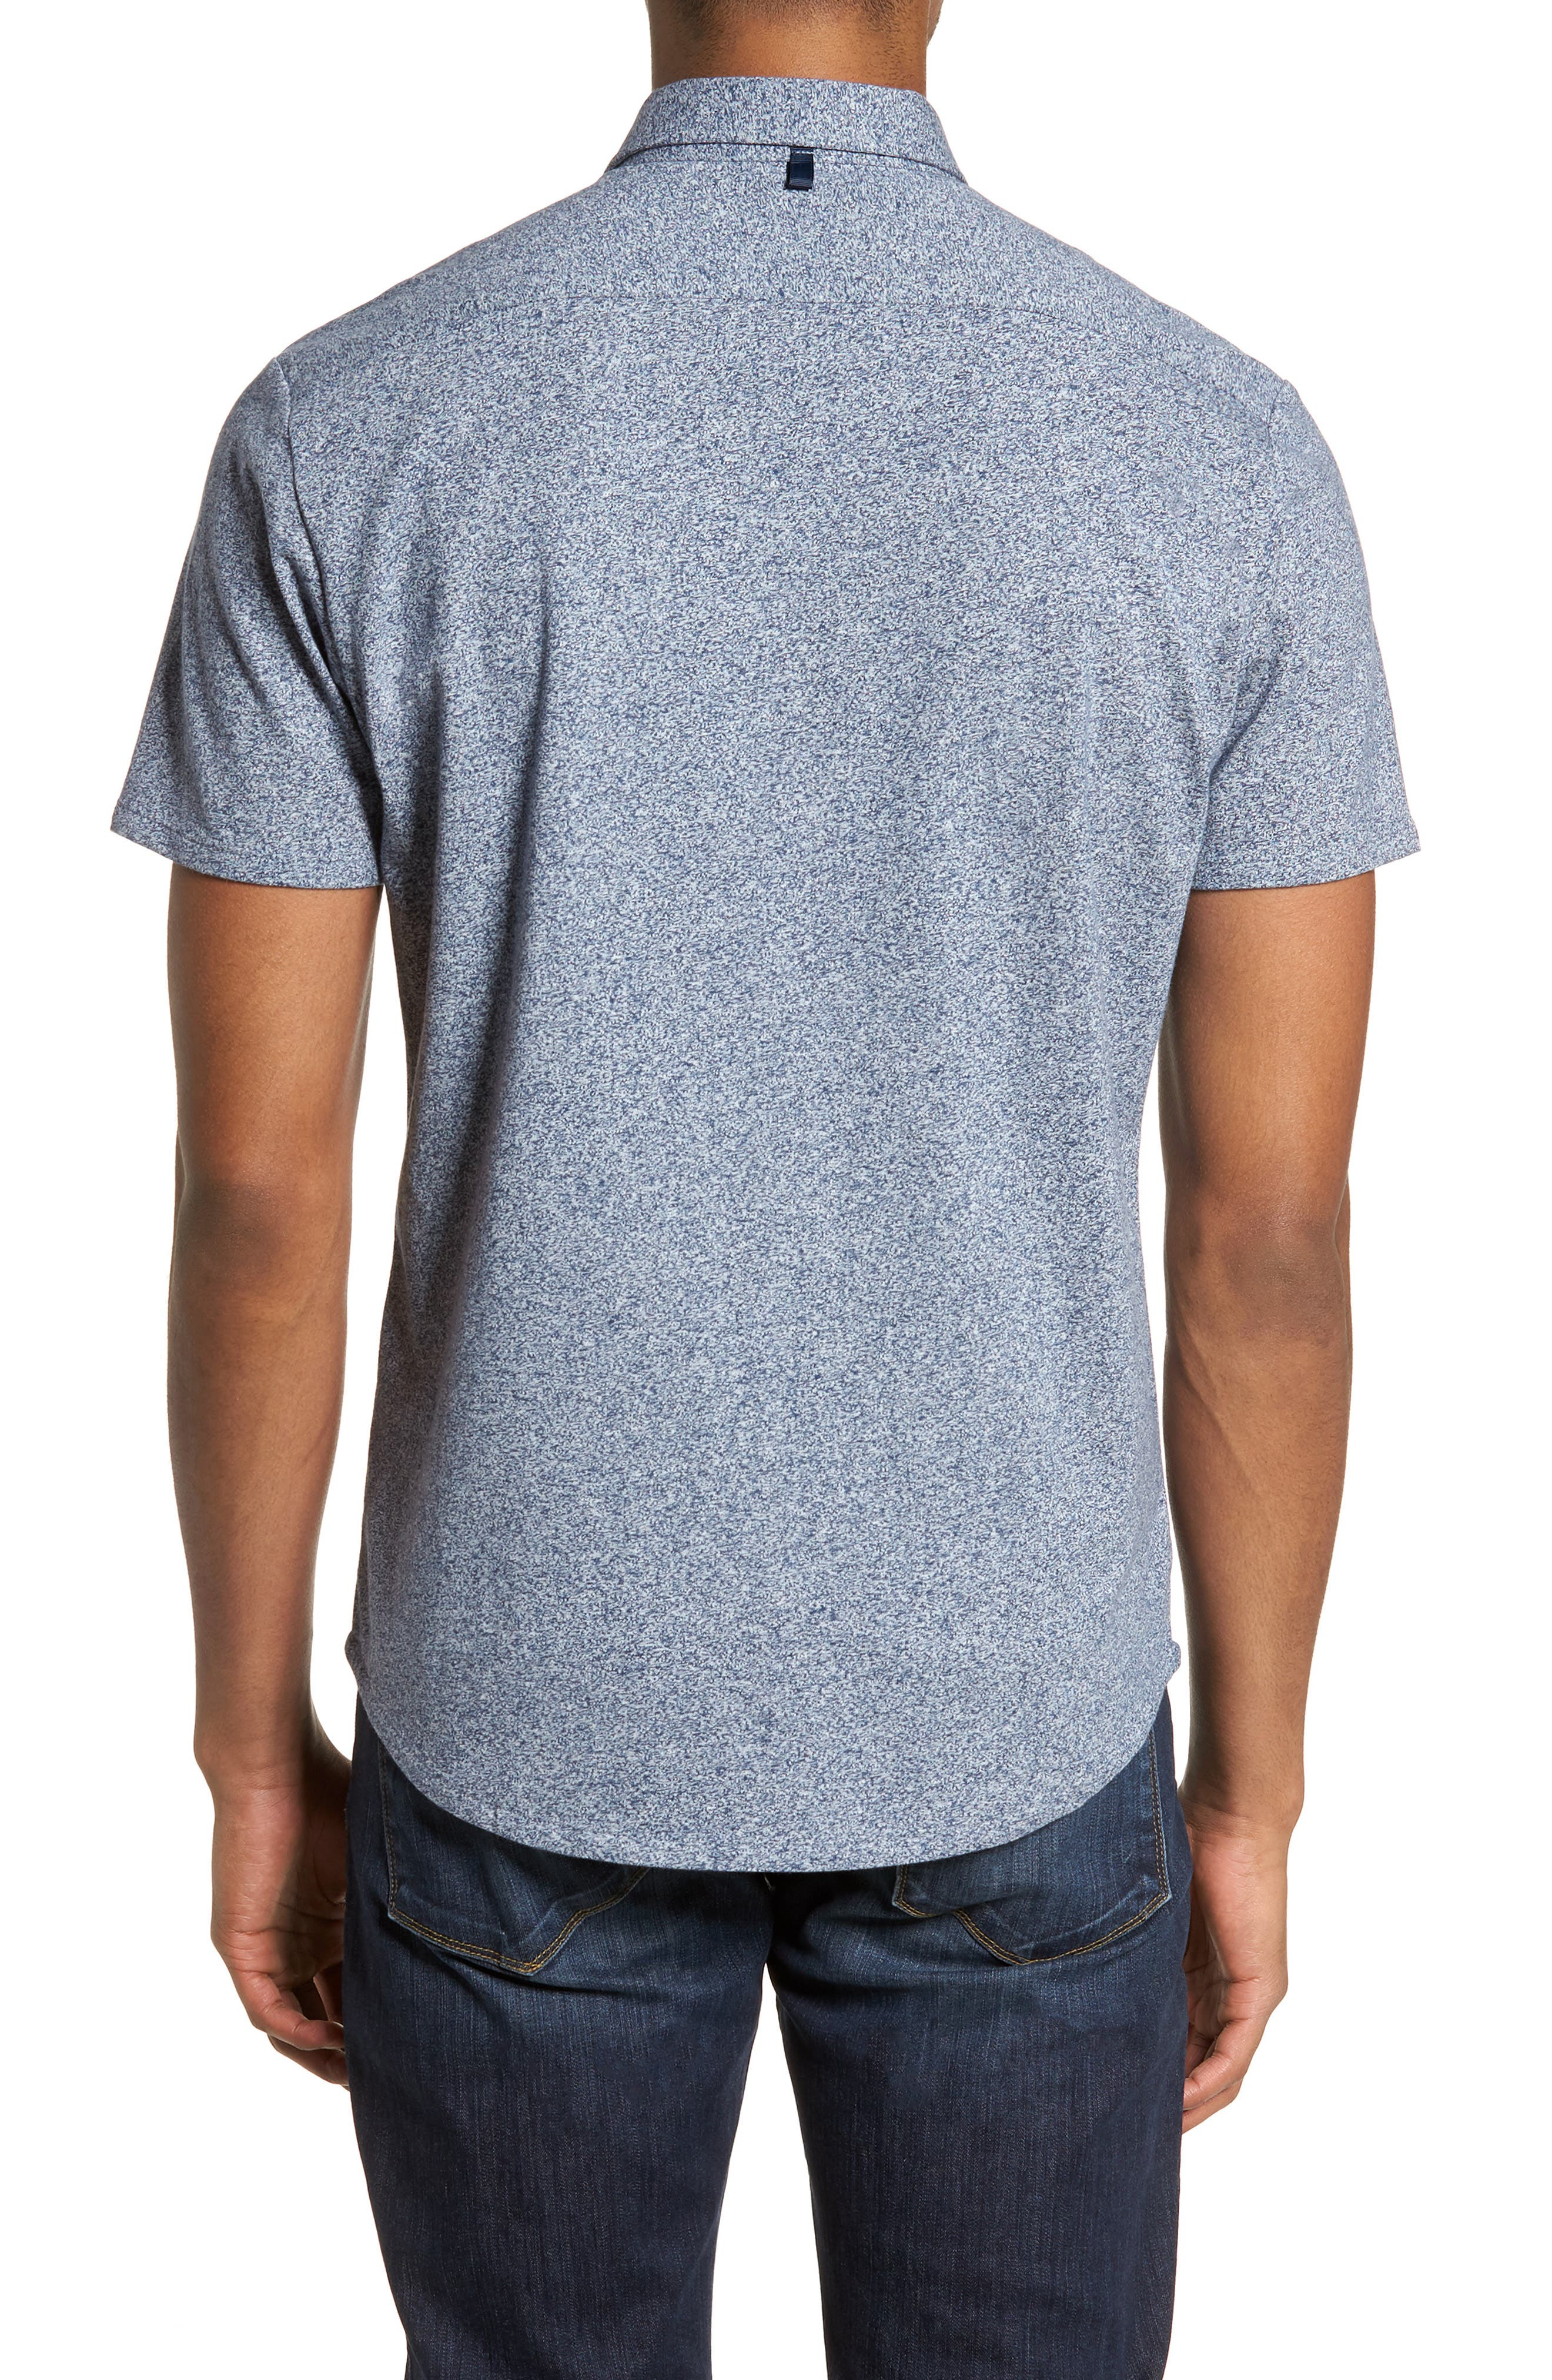 'Metropolitan' Knit Short Sleeve Sport Shirt,                             Alternate thumbnail 2, color,                             NAVY/ WHITE